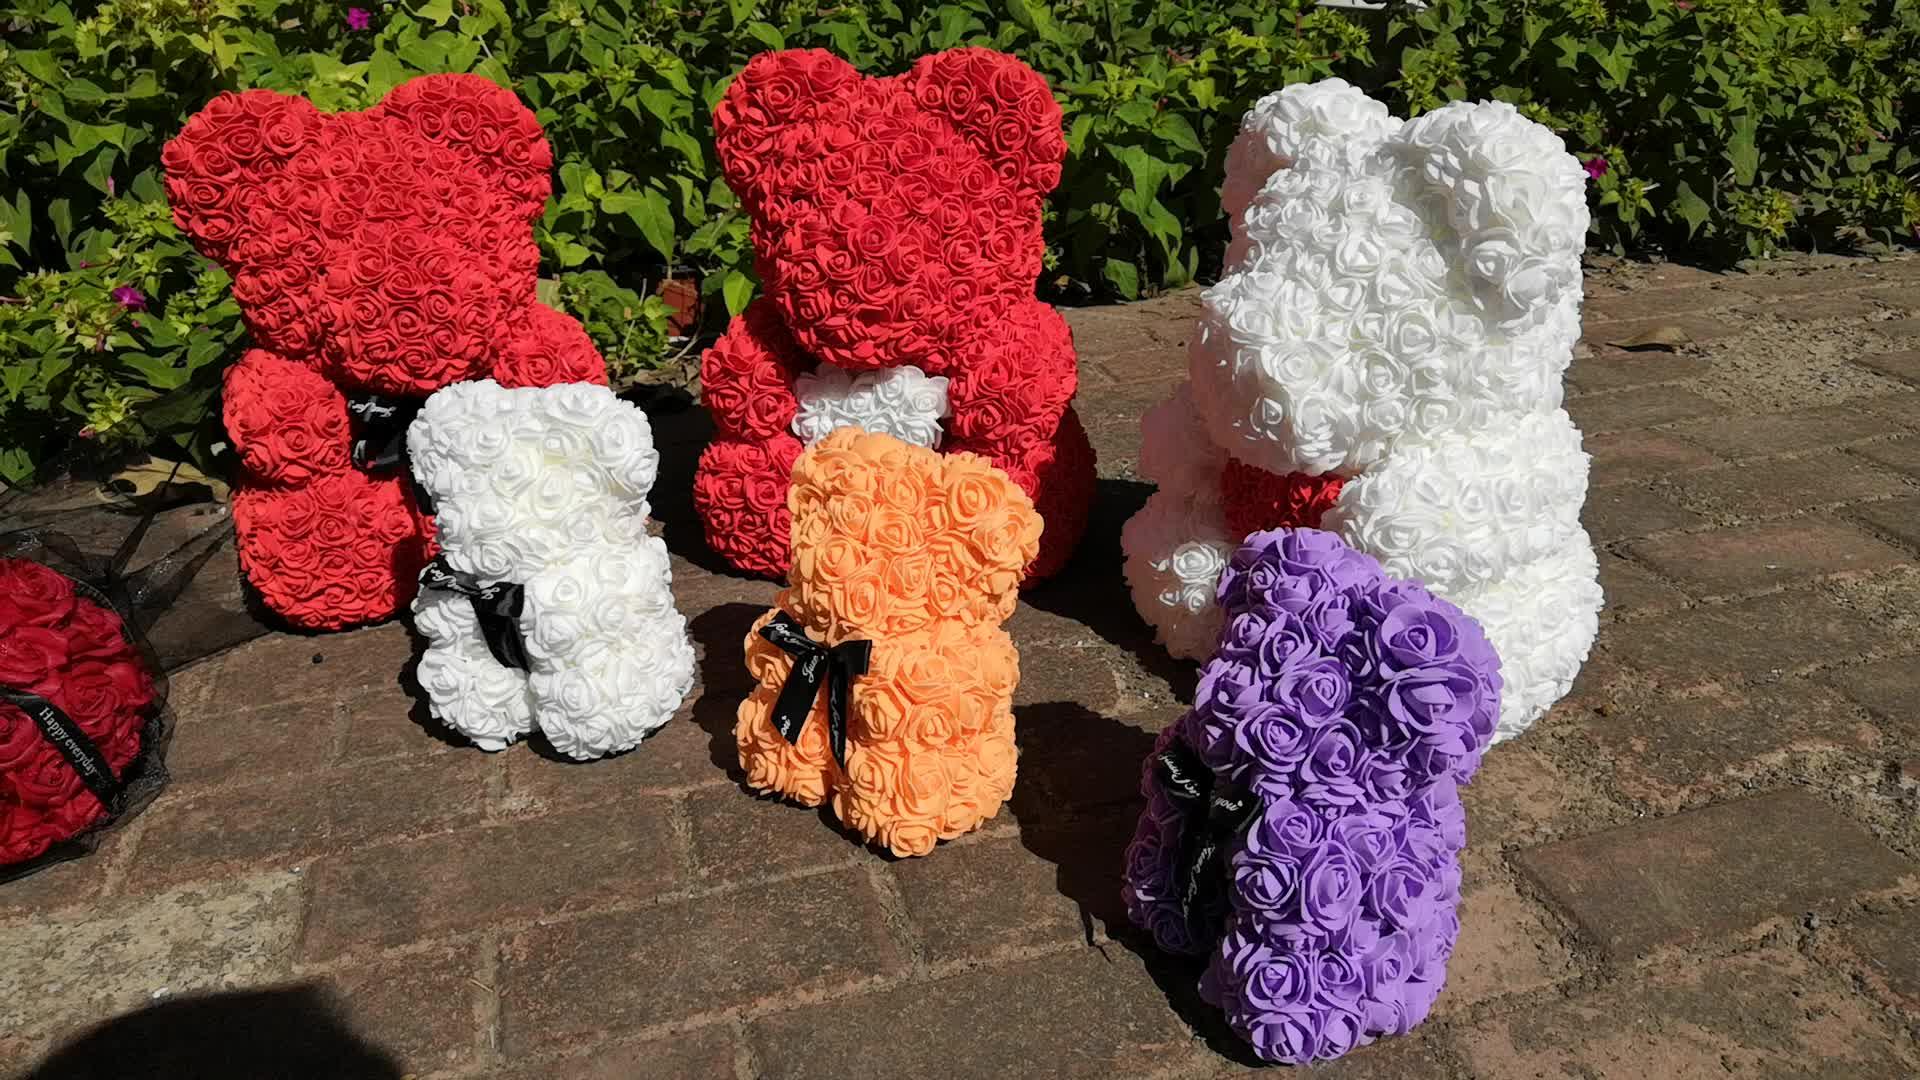 70cm  Forever Handmade Foam Rose Teddy bear /Valentine's day/girlfriend gift/artificial flowersbears/With heart rown or Bow